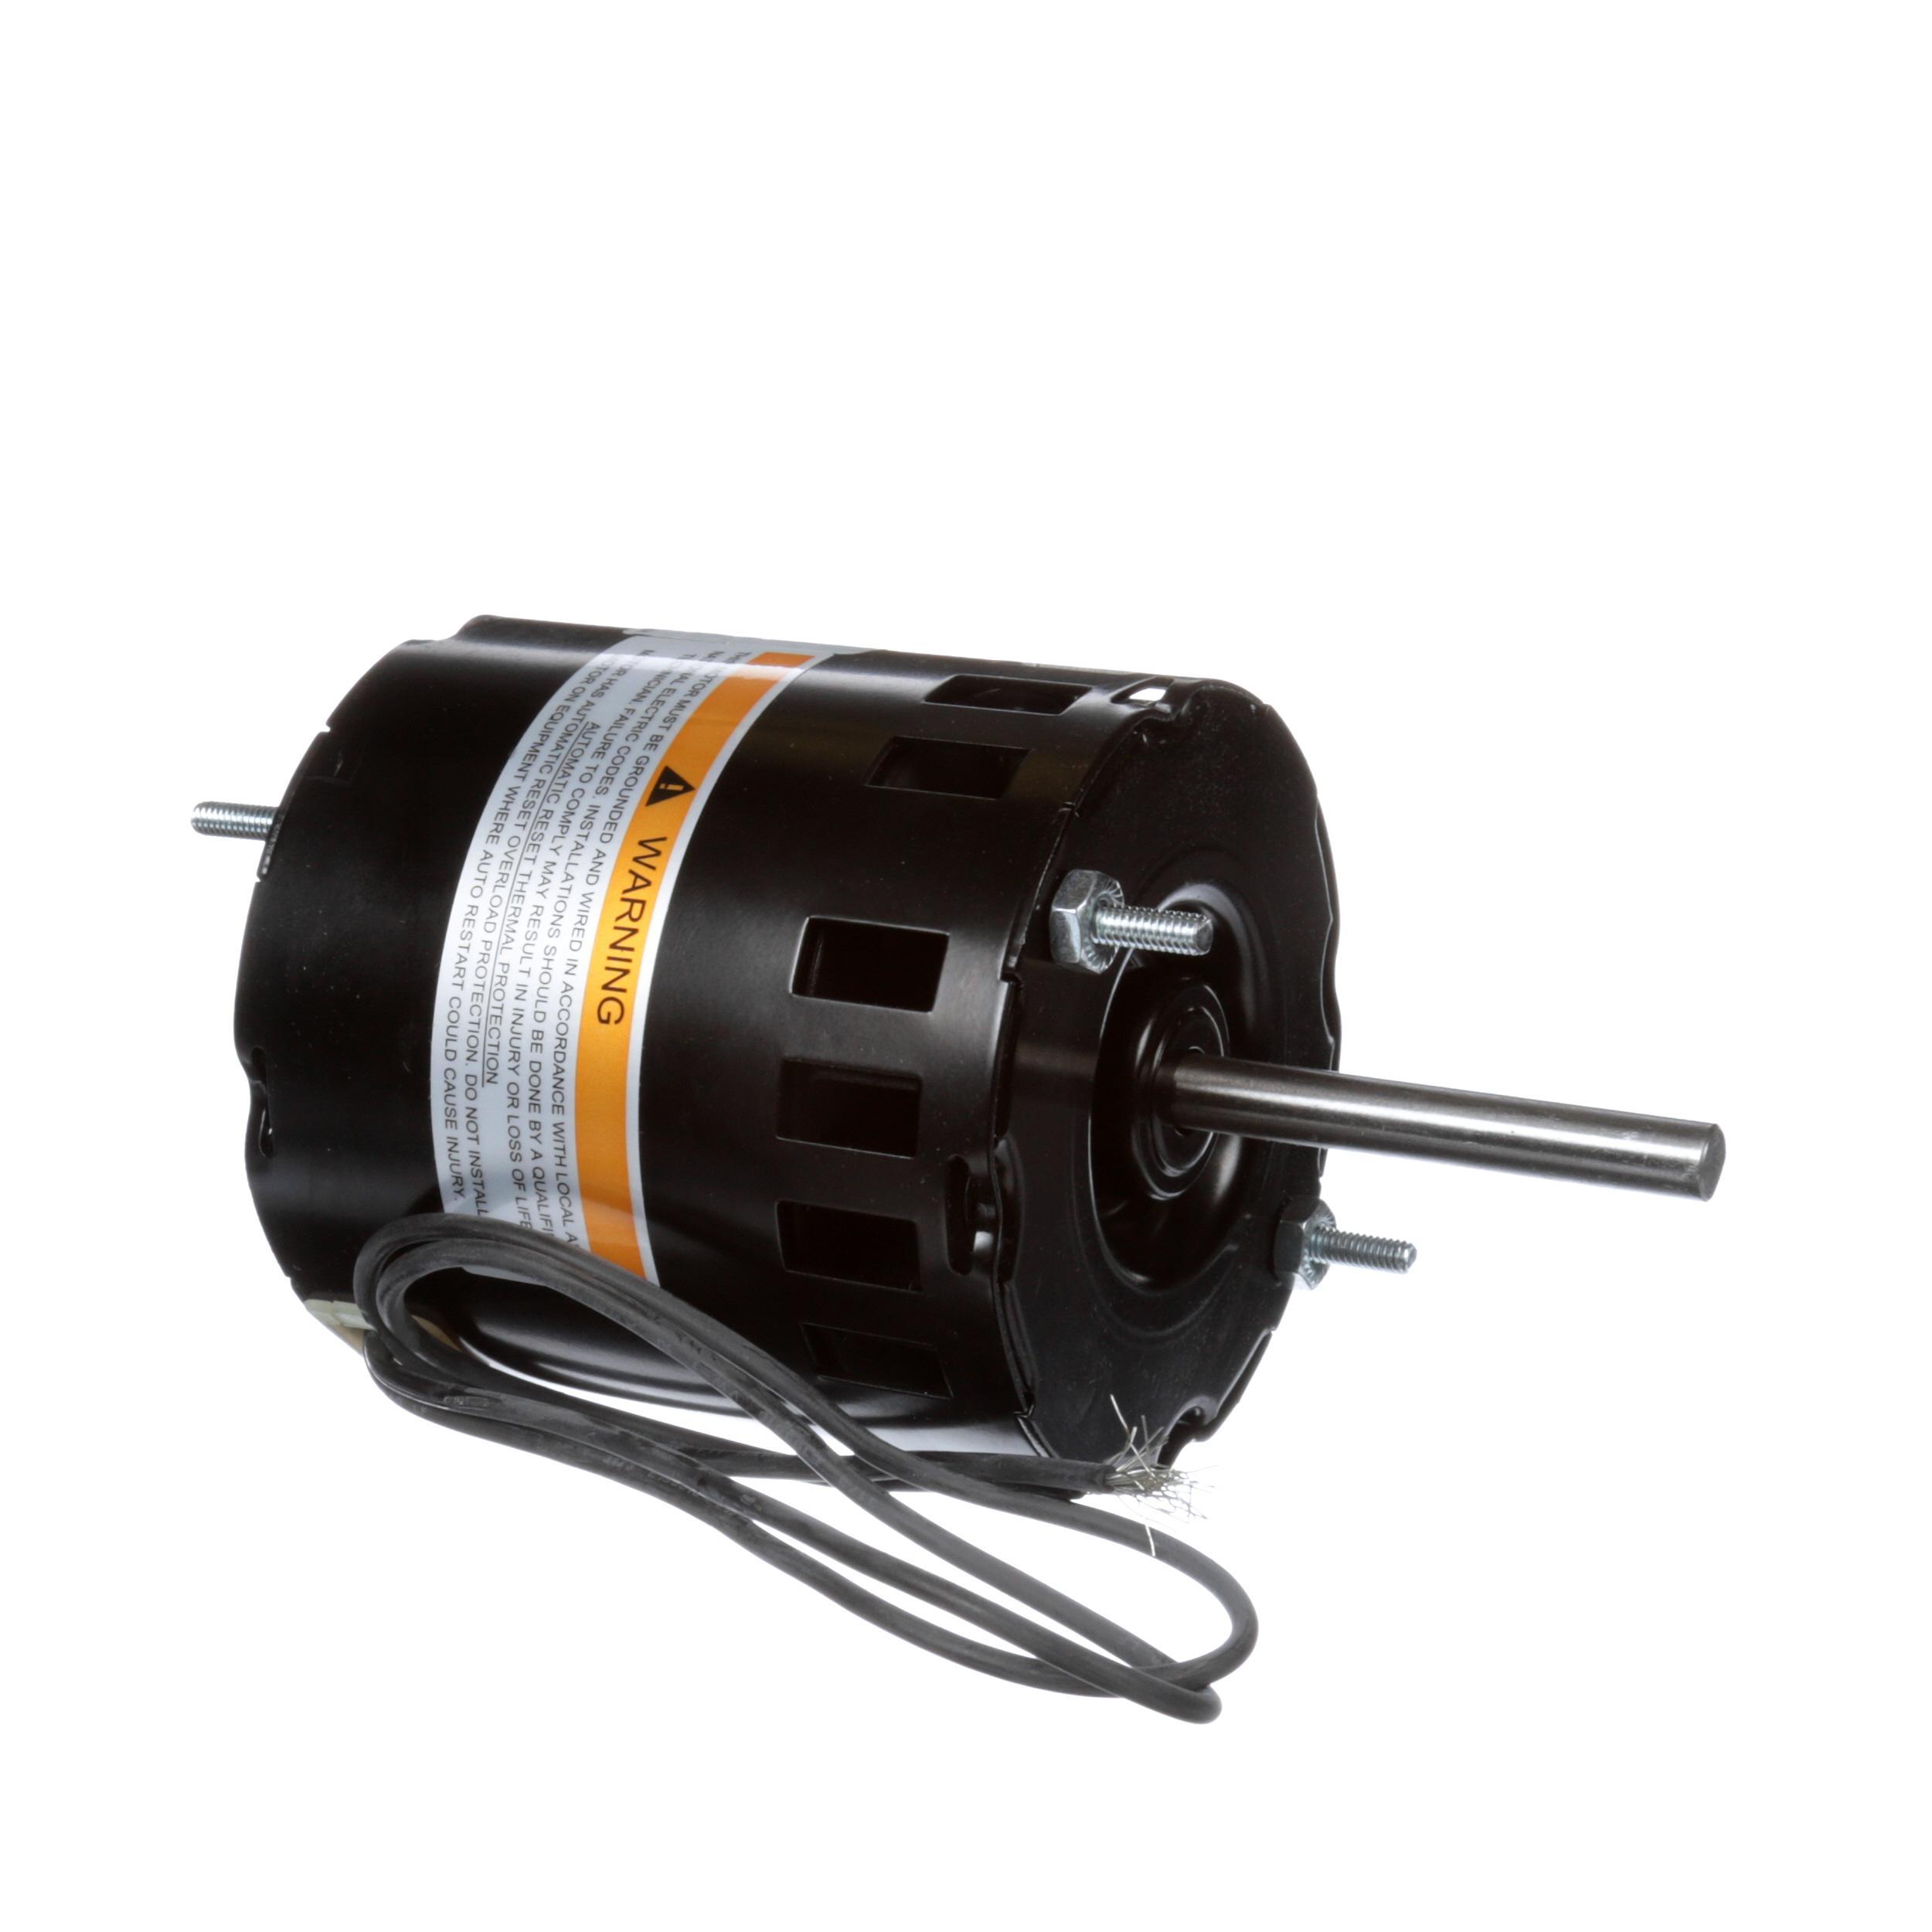 Texican 1 40 hp blower motor part tsp 100 for 1 hp blower motor